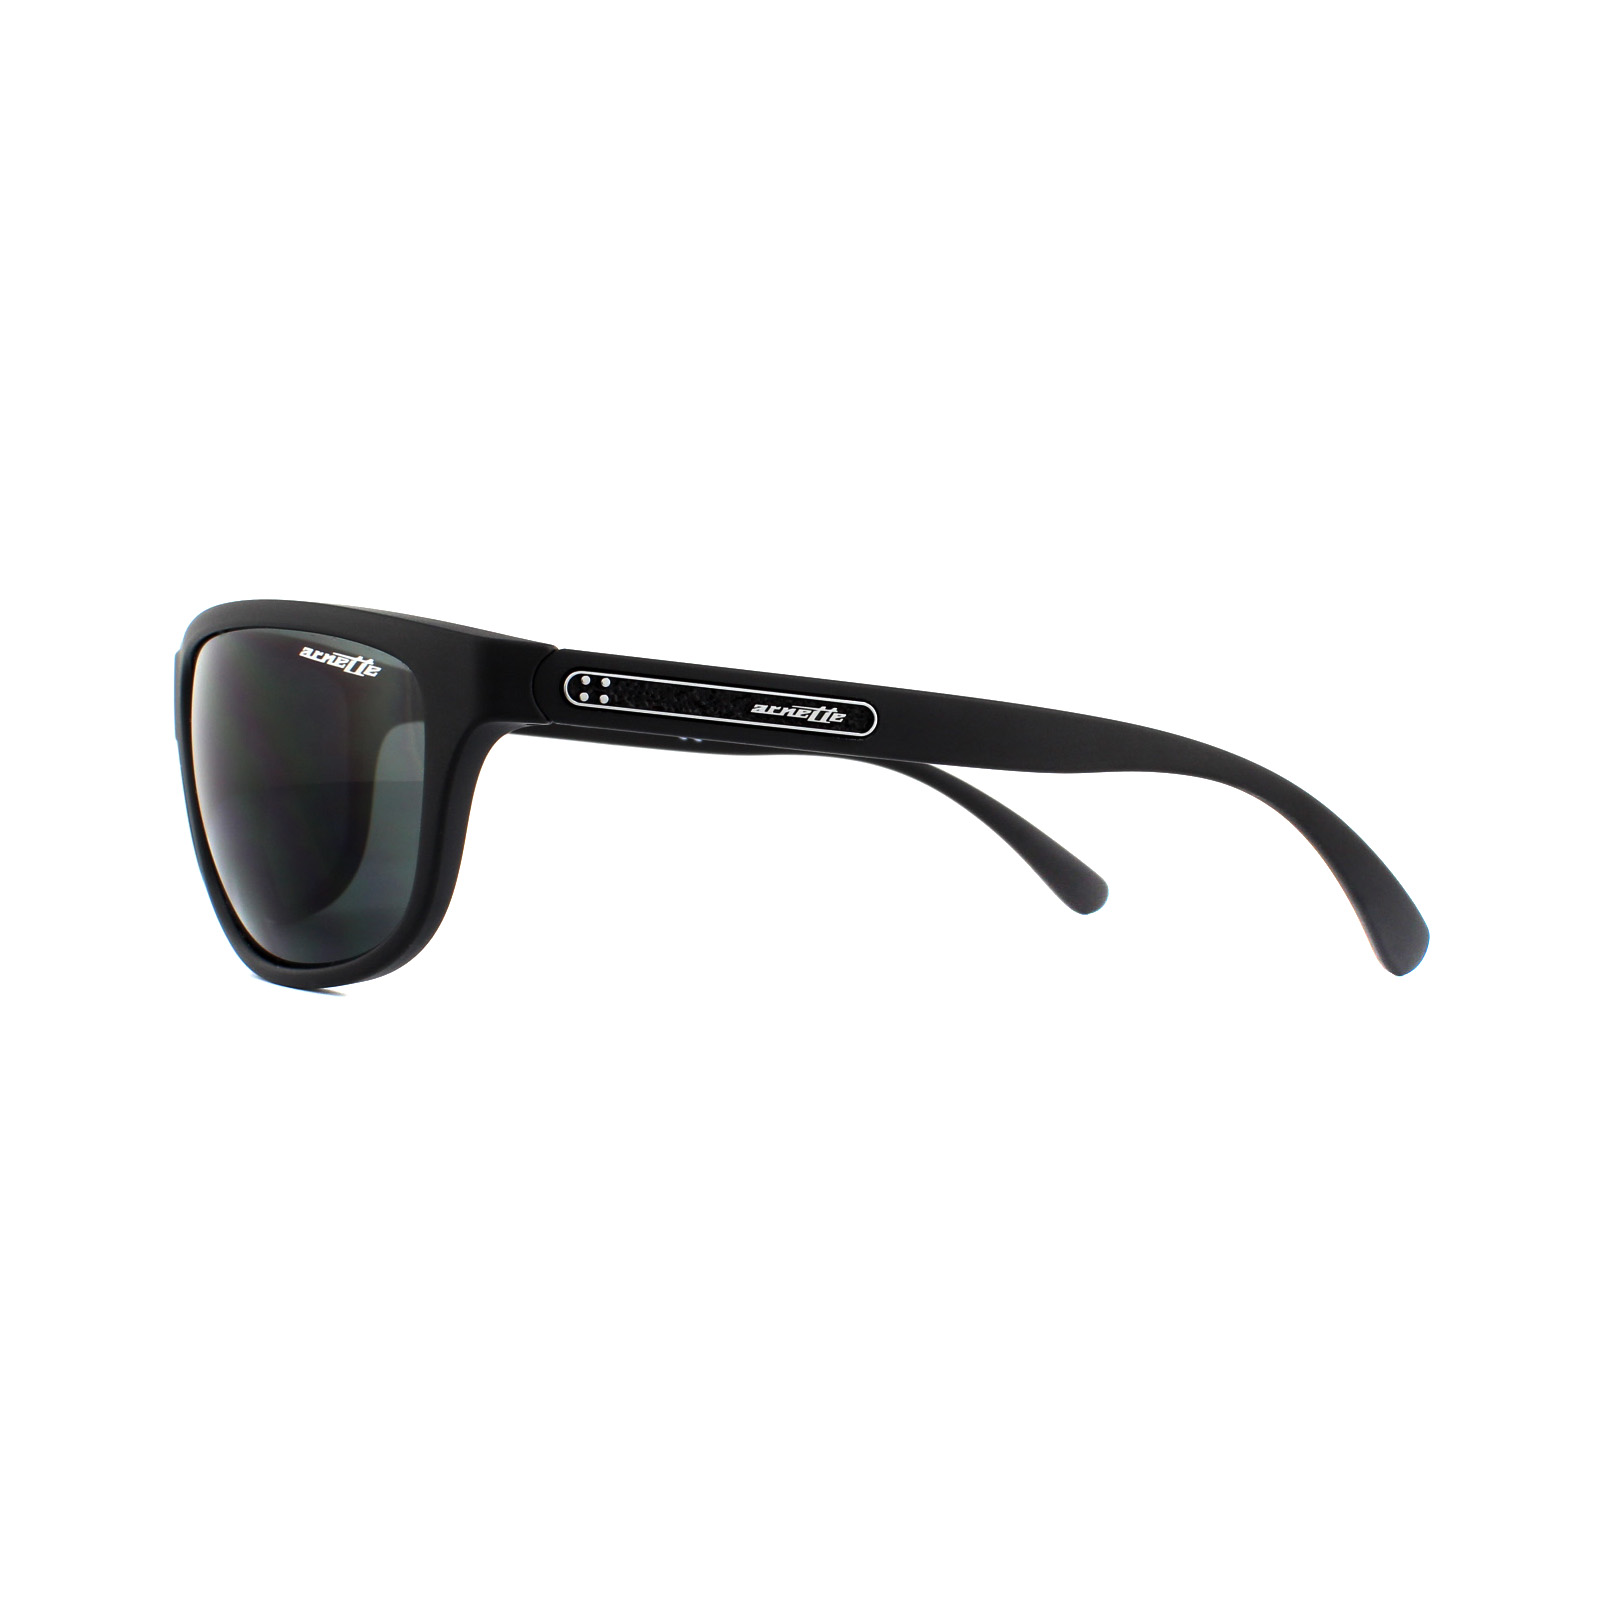 28c9b0bdc0 Sentinel Arnette Sunglasses Grip Tape 4246 01/87 Matte Black Grey